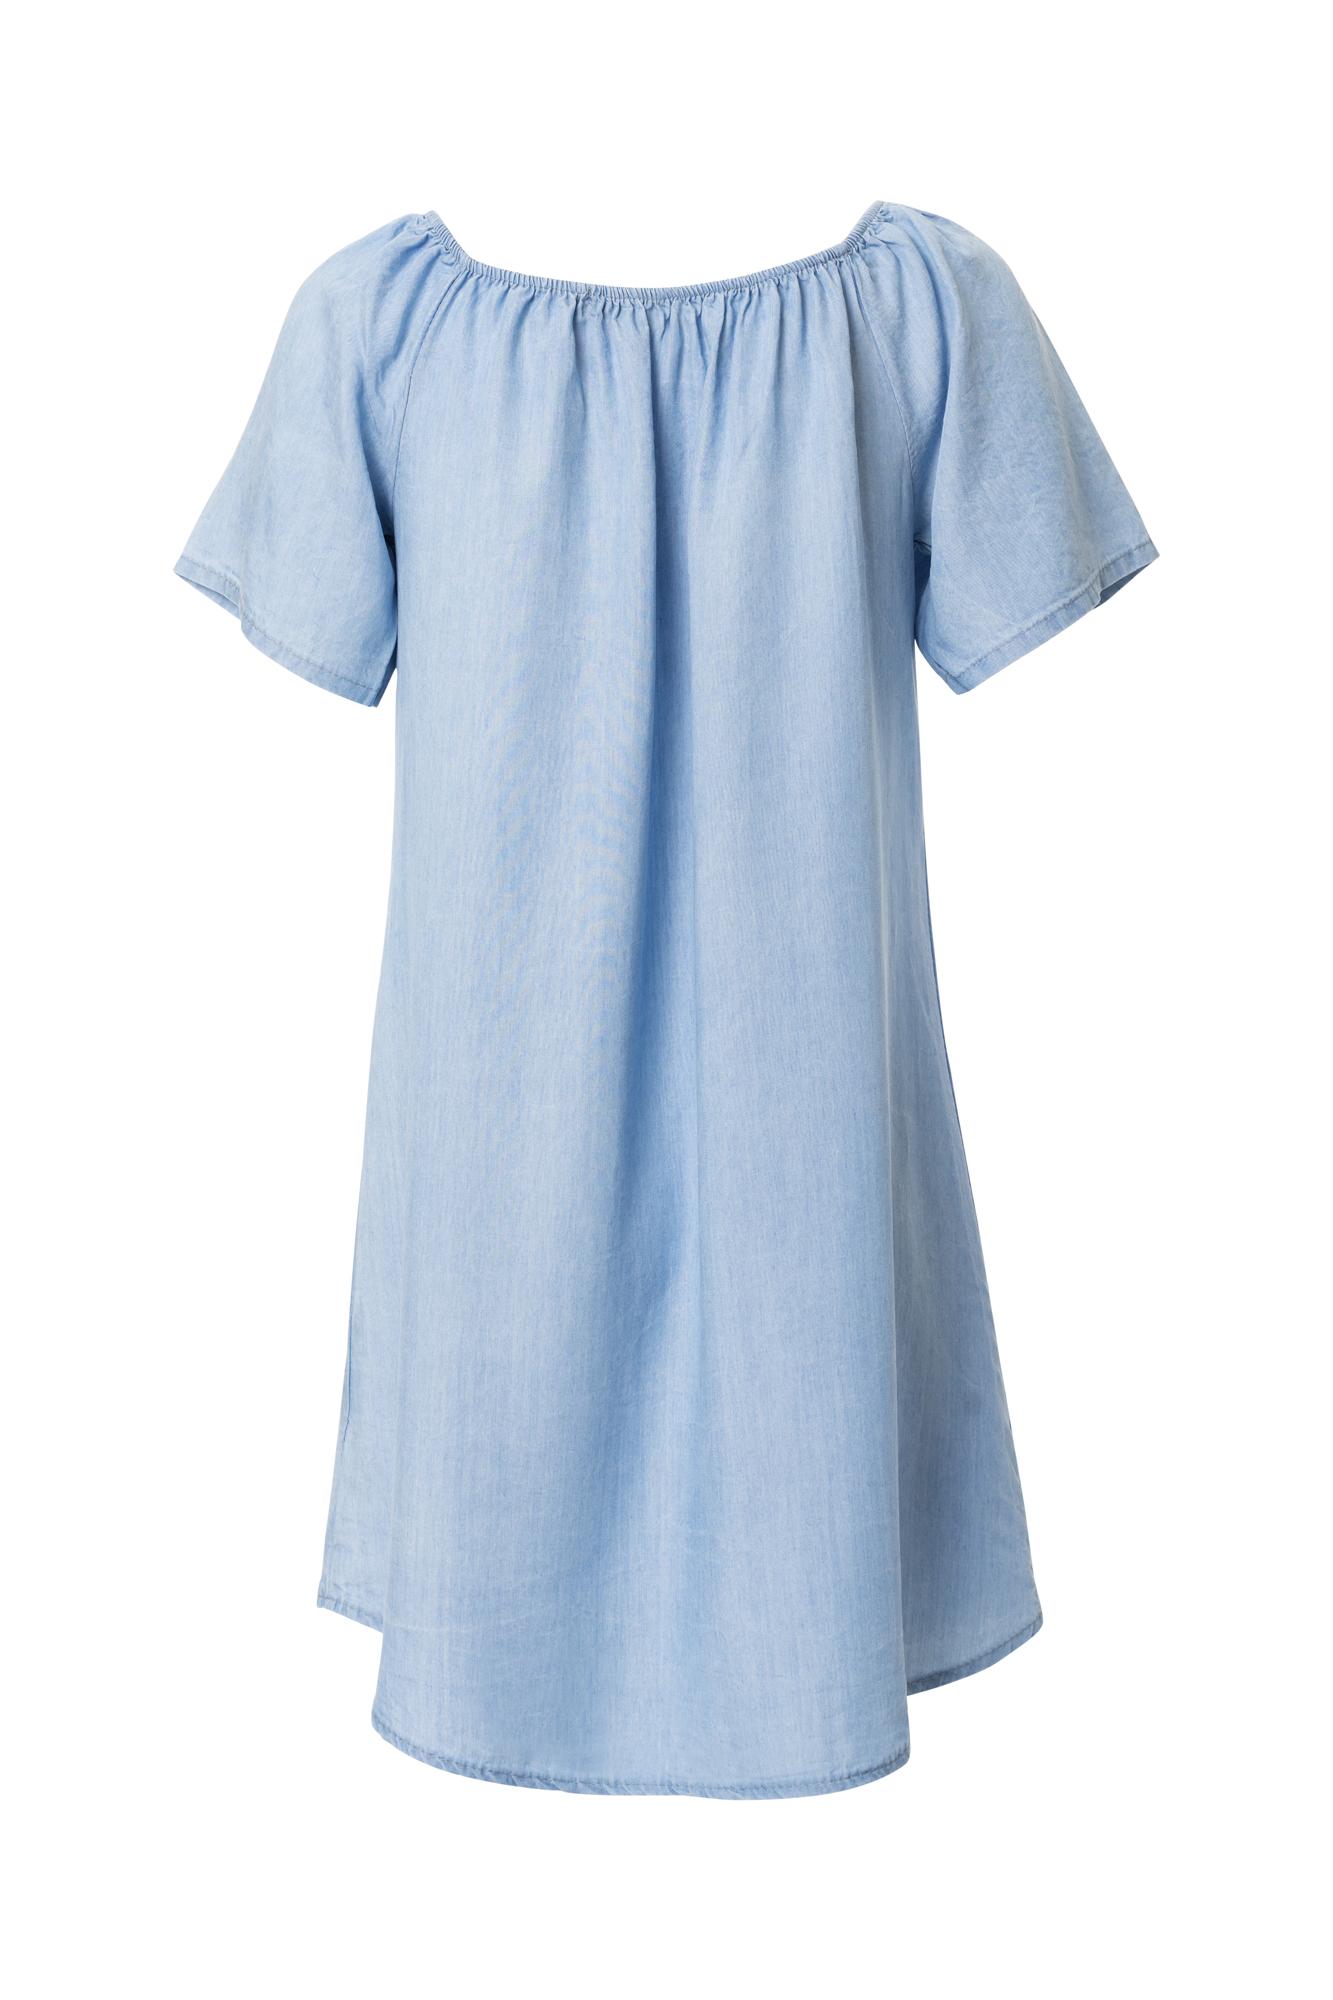 Vestino-Damen-Tunika-Kleid-Mini-Kleid-Jeans-Look-Kurzarm-Tunika-Offshoulder Indexbild 2